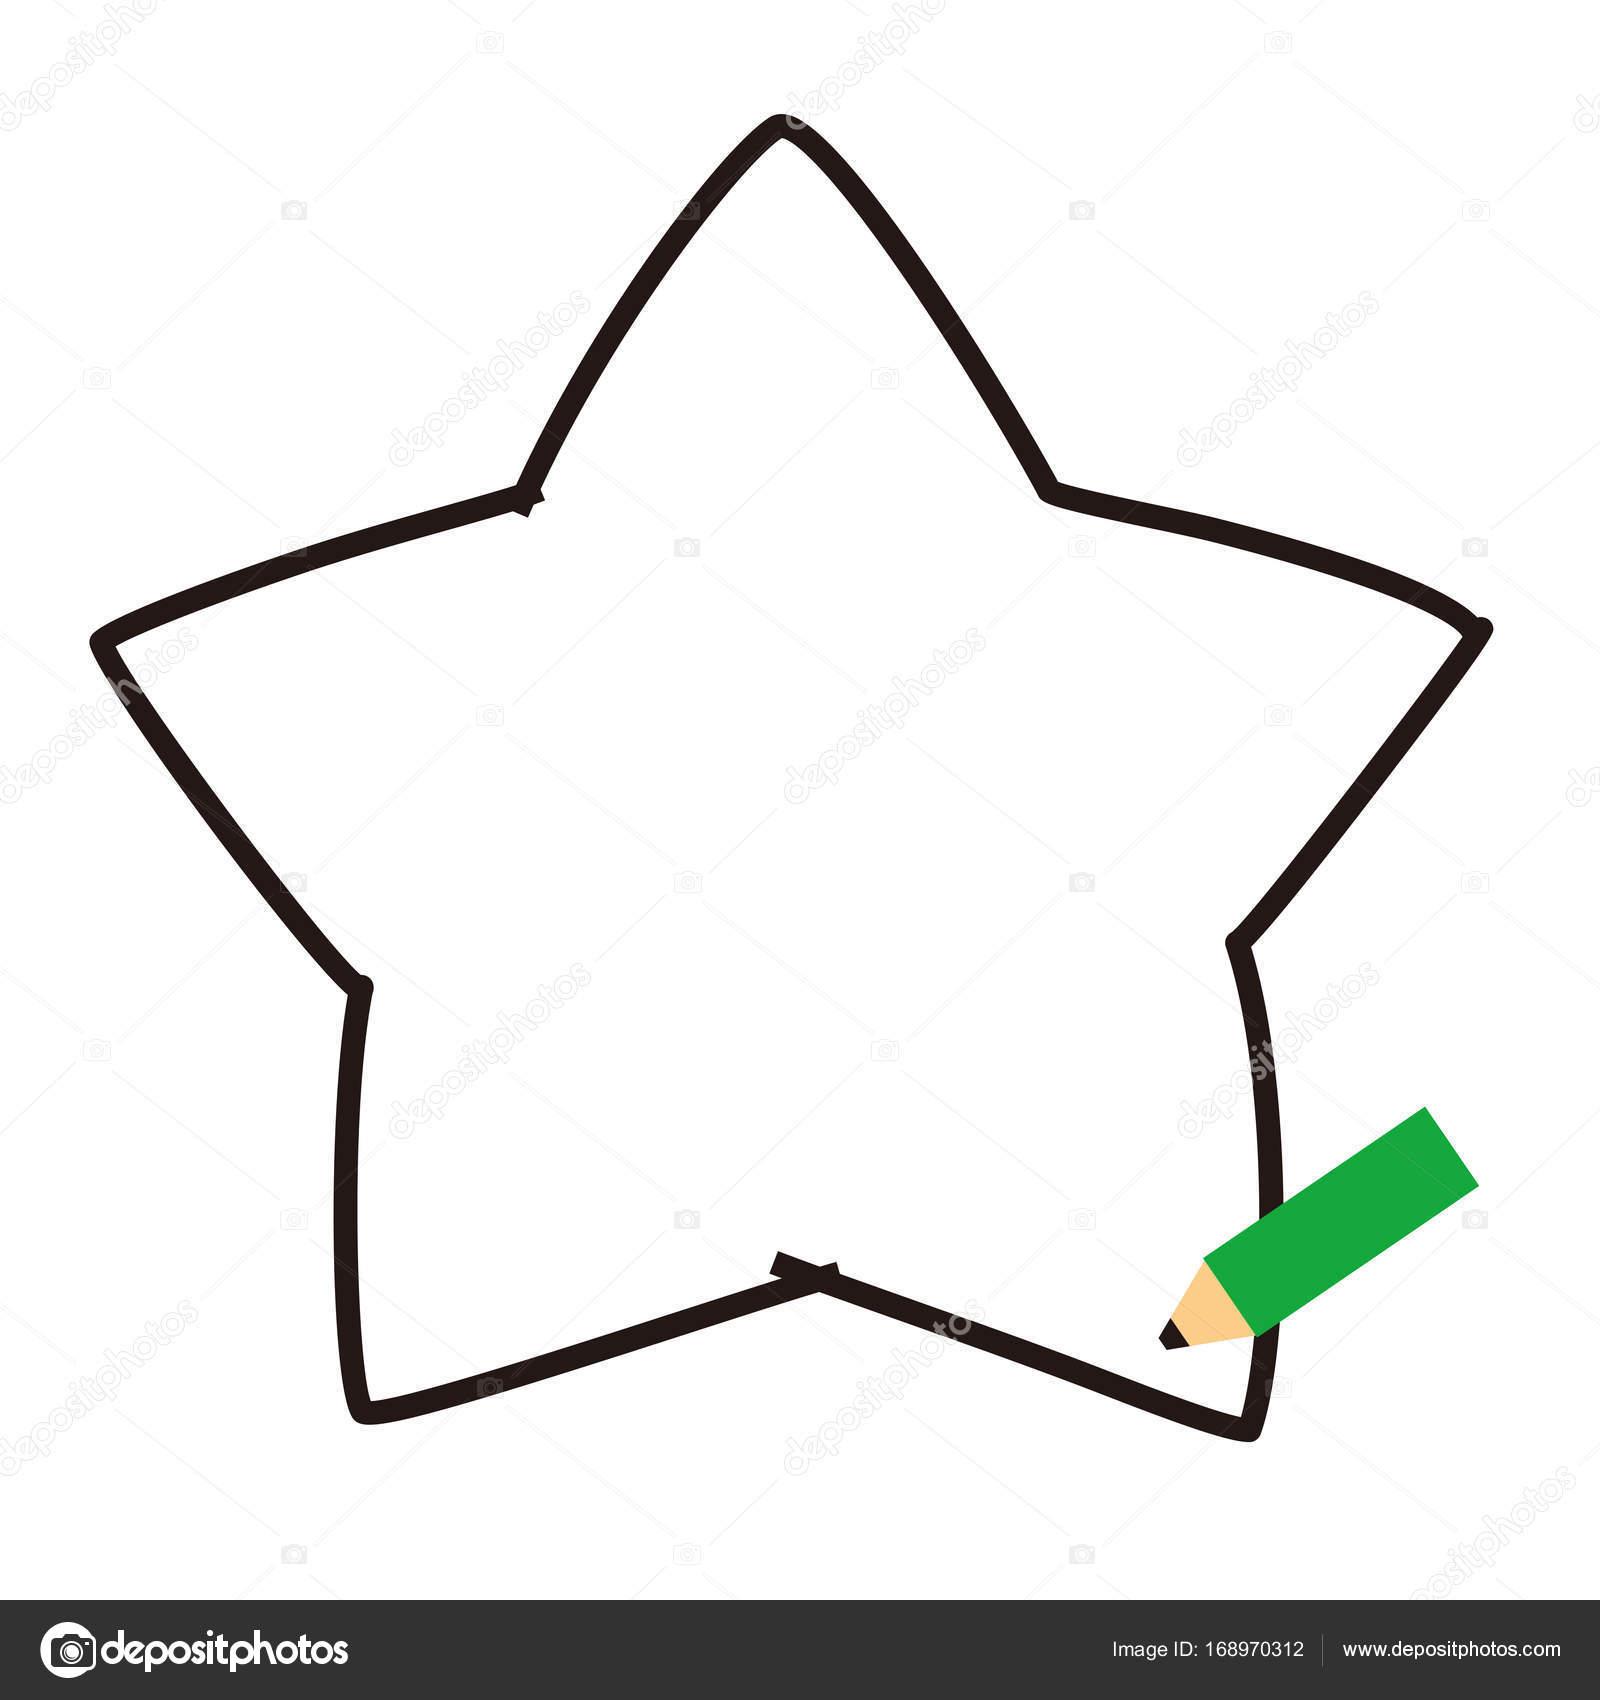 marcos de lápices, forma de estrella — Fotos de Stock © niow #168970312